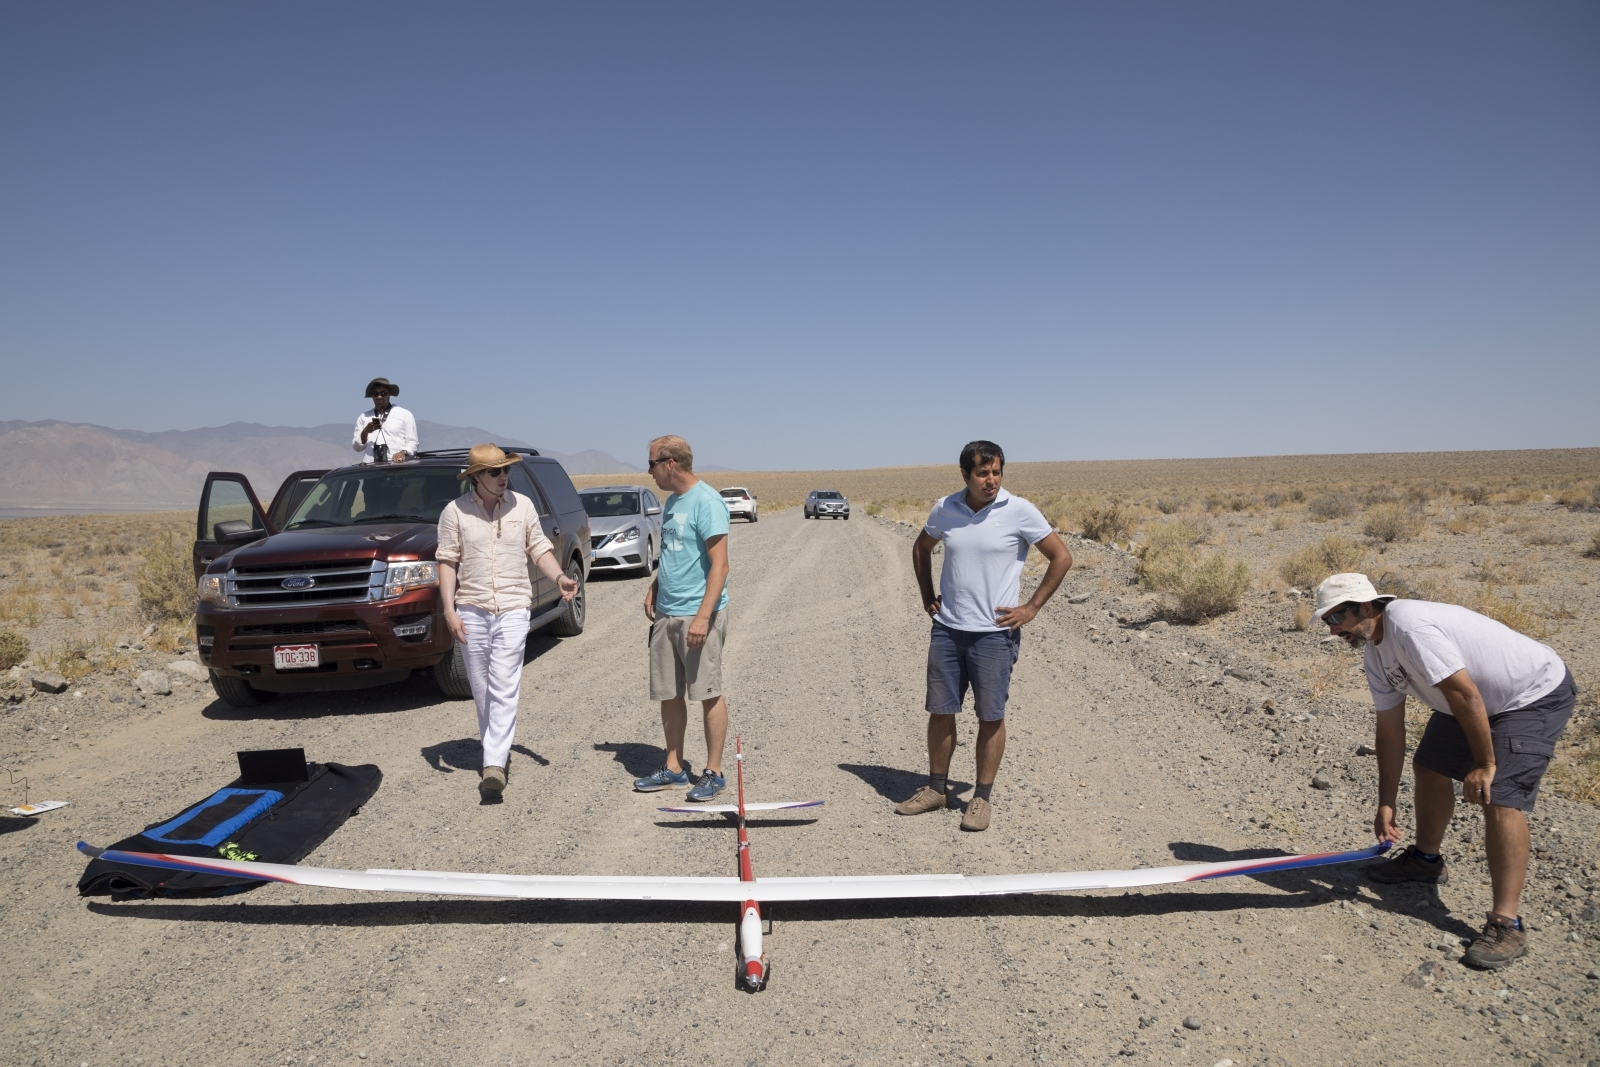 Microsoft's autonomous glider